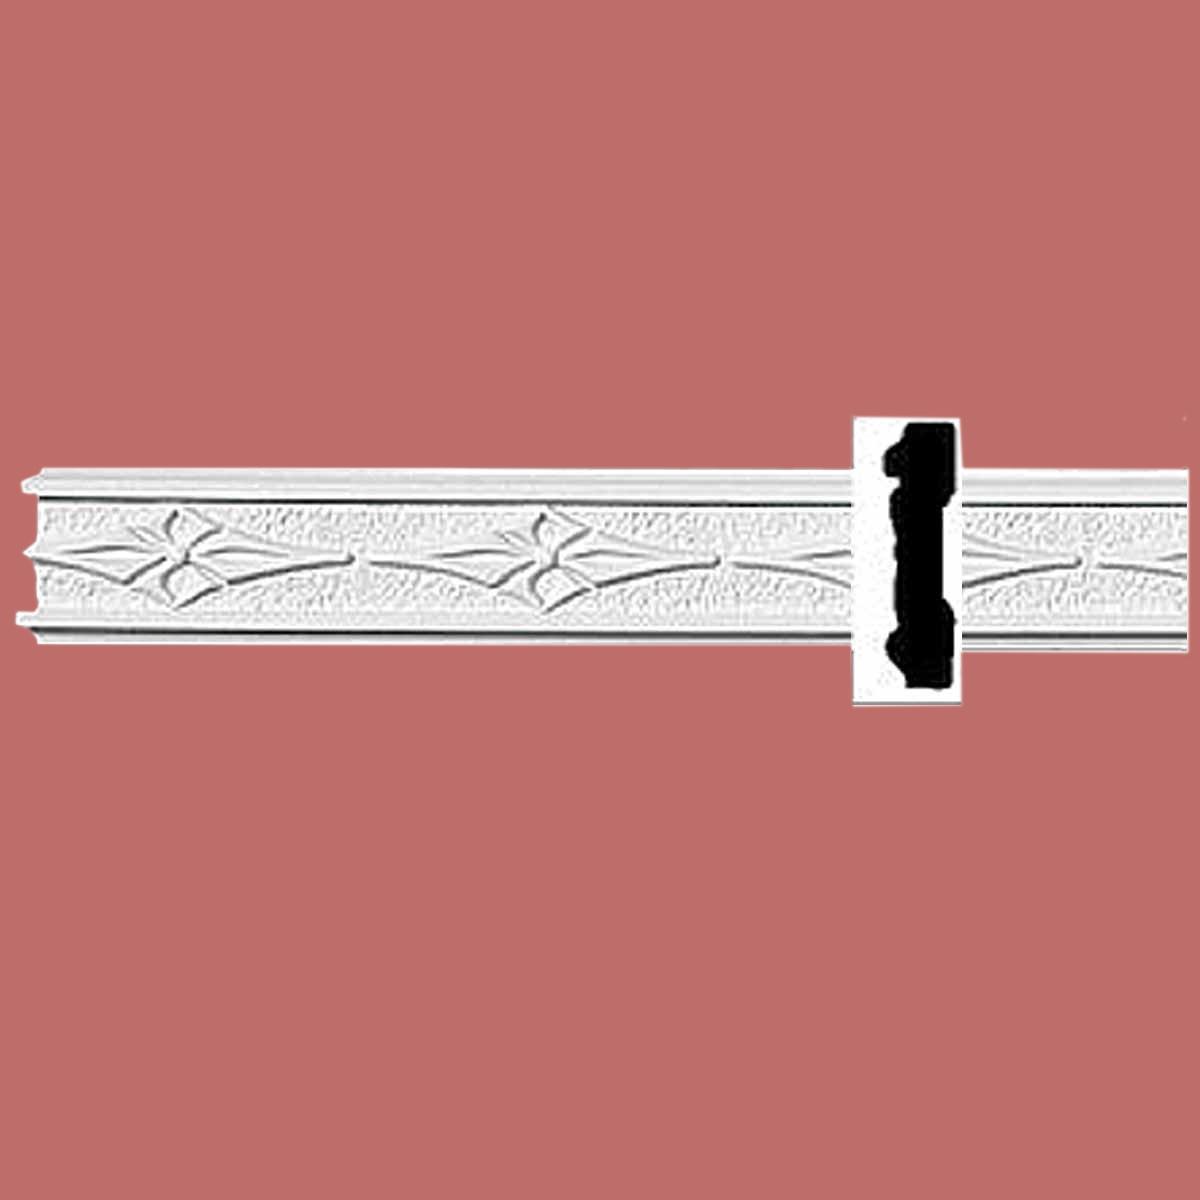 Cornice White Urethane 24 Sample of 11619 Cornice Cornice Moulding Cornice Molding